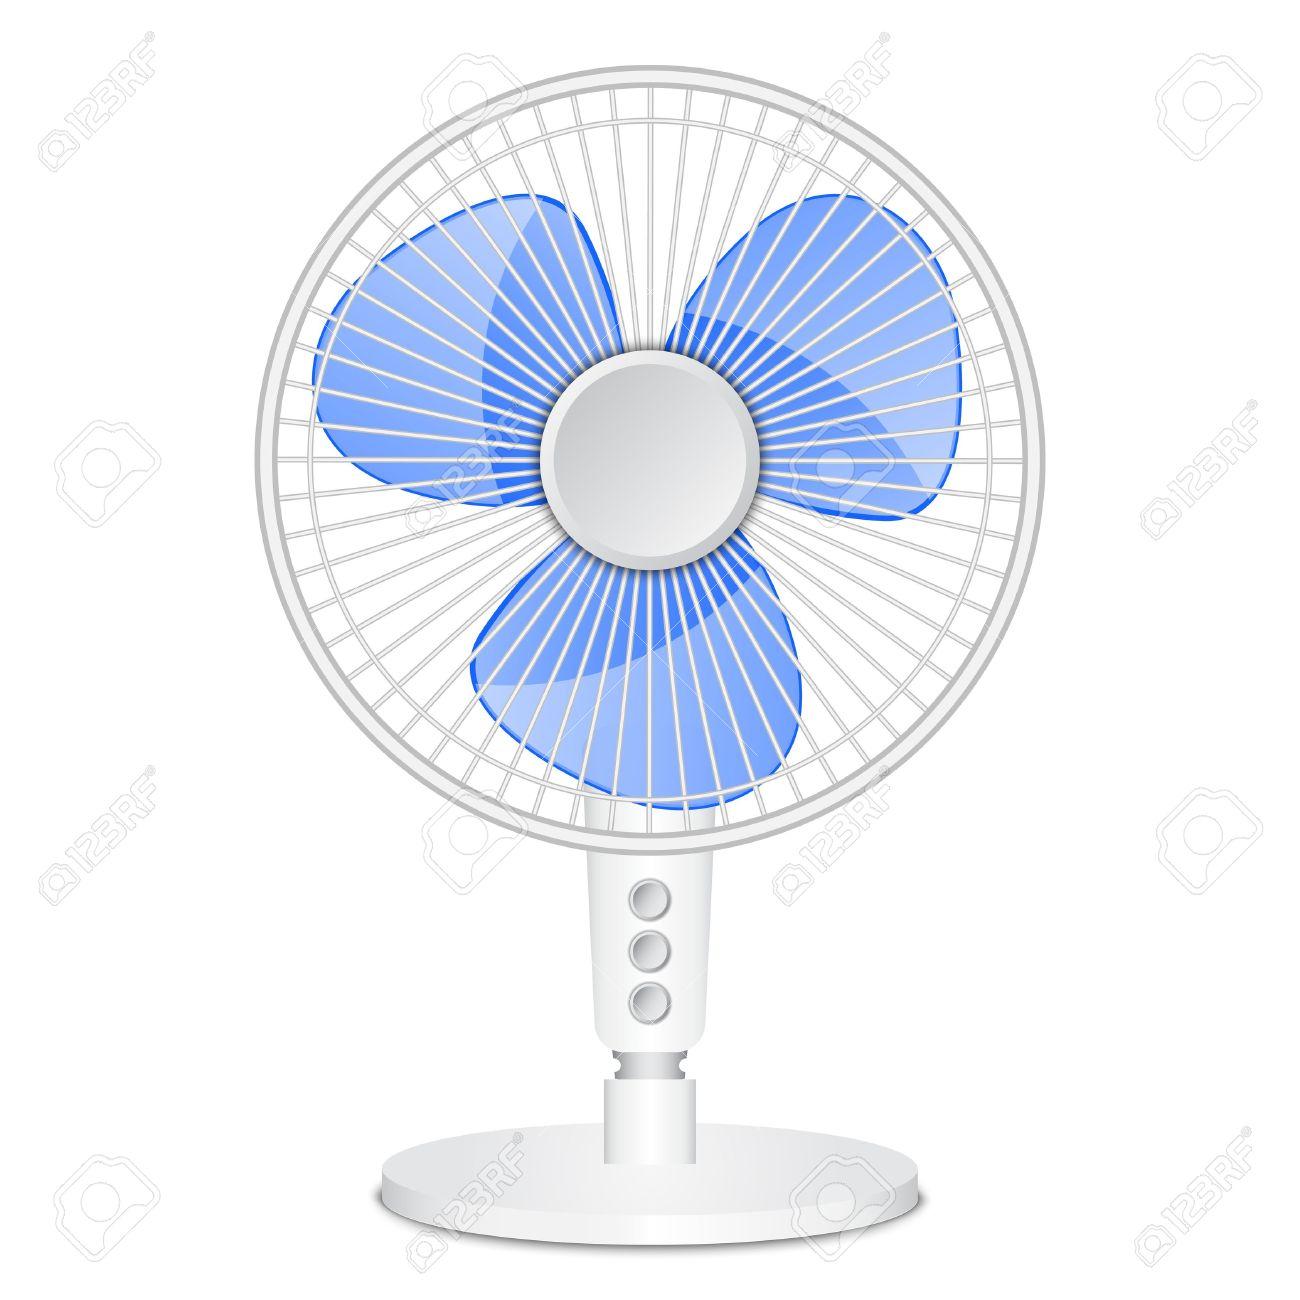 vector illustration of electric fan royalty free cliparts vectors rh 123rf com fan clipart png fan clipart images